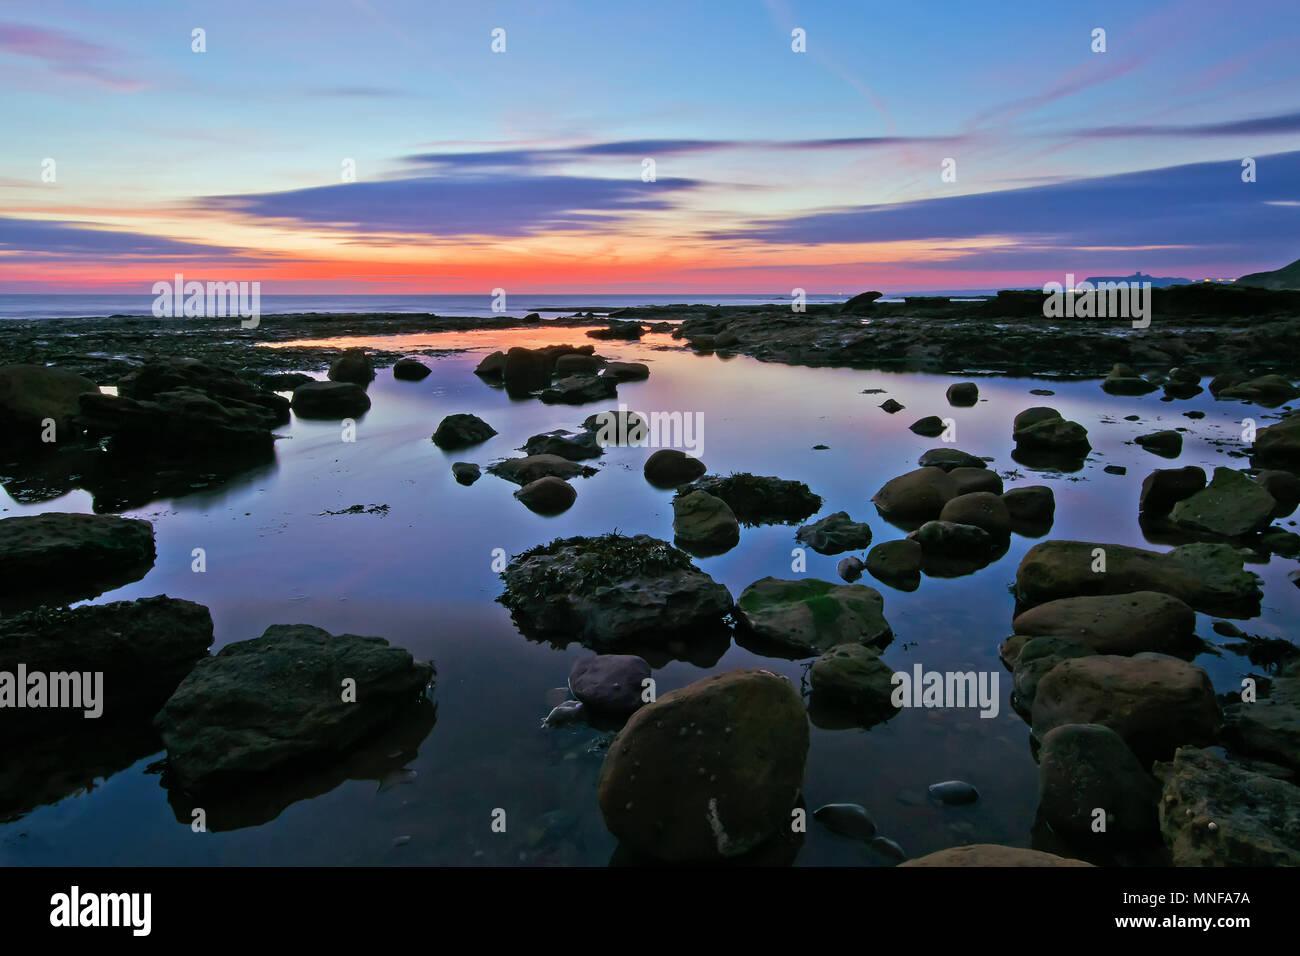 Coastal rock pools reflect the brilliant hues of dawn before sunrise at Crook Ness, near Scarborough. - Stock Image